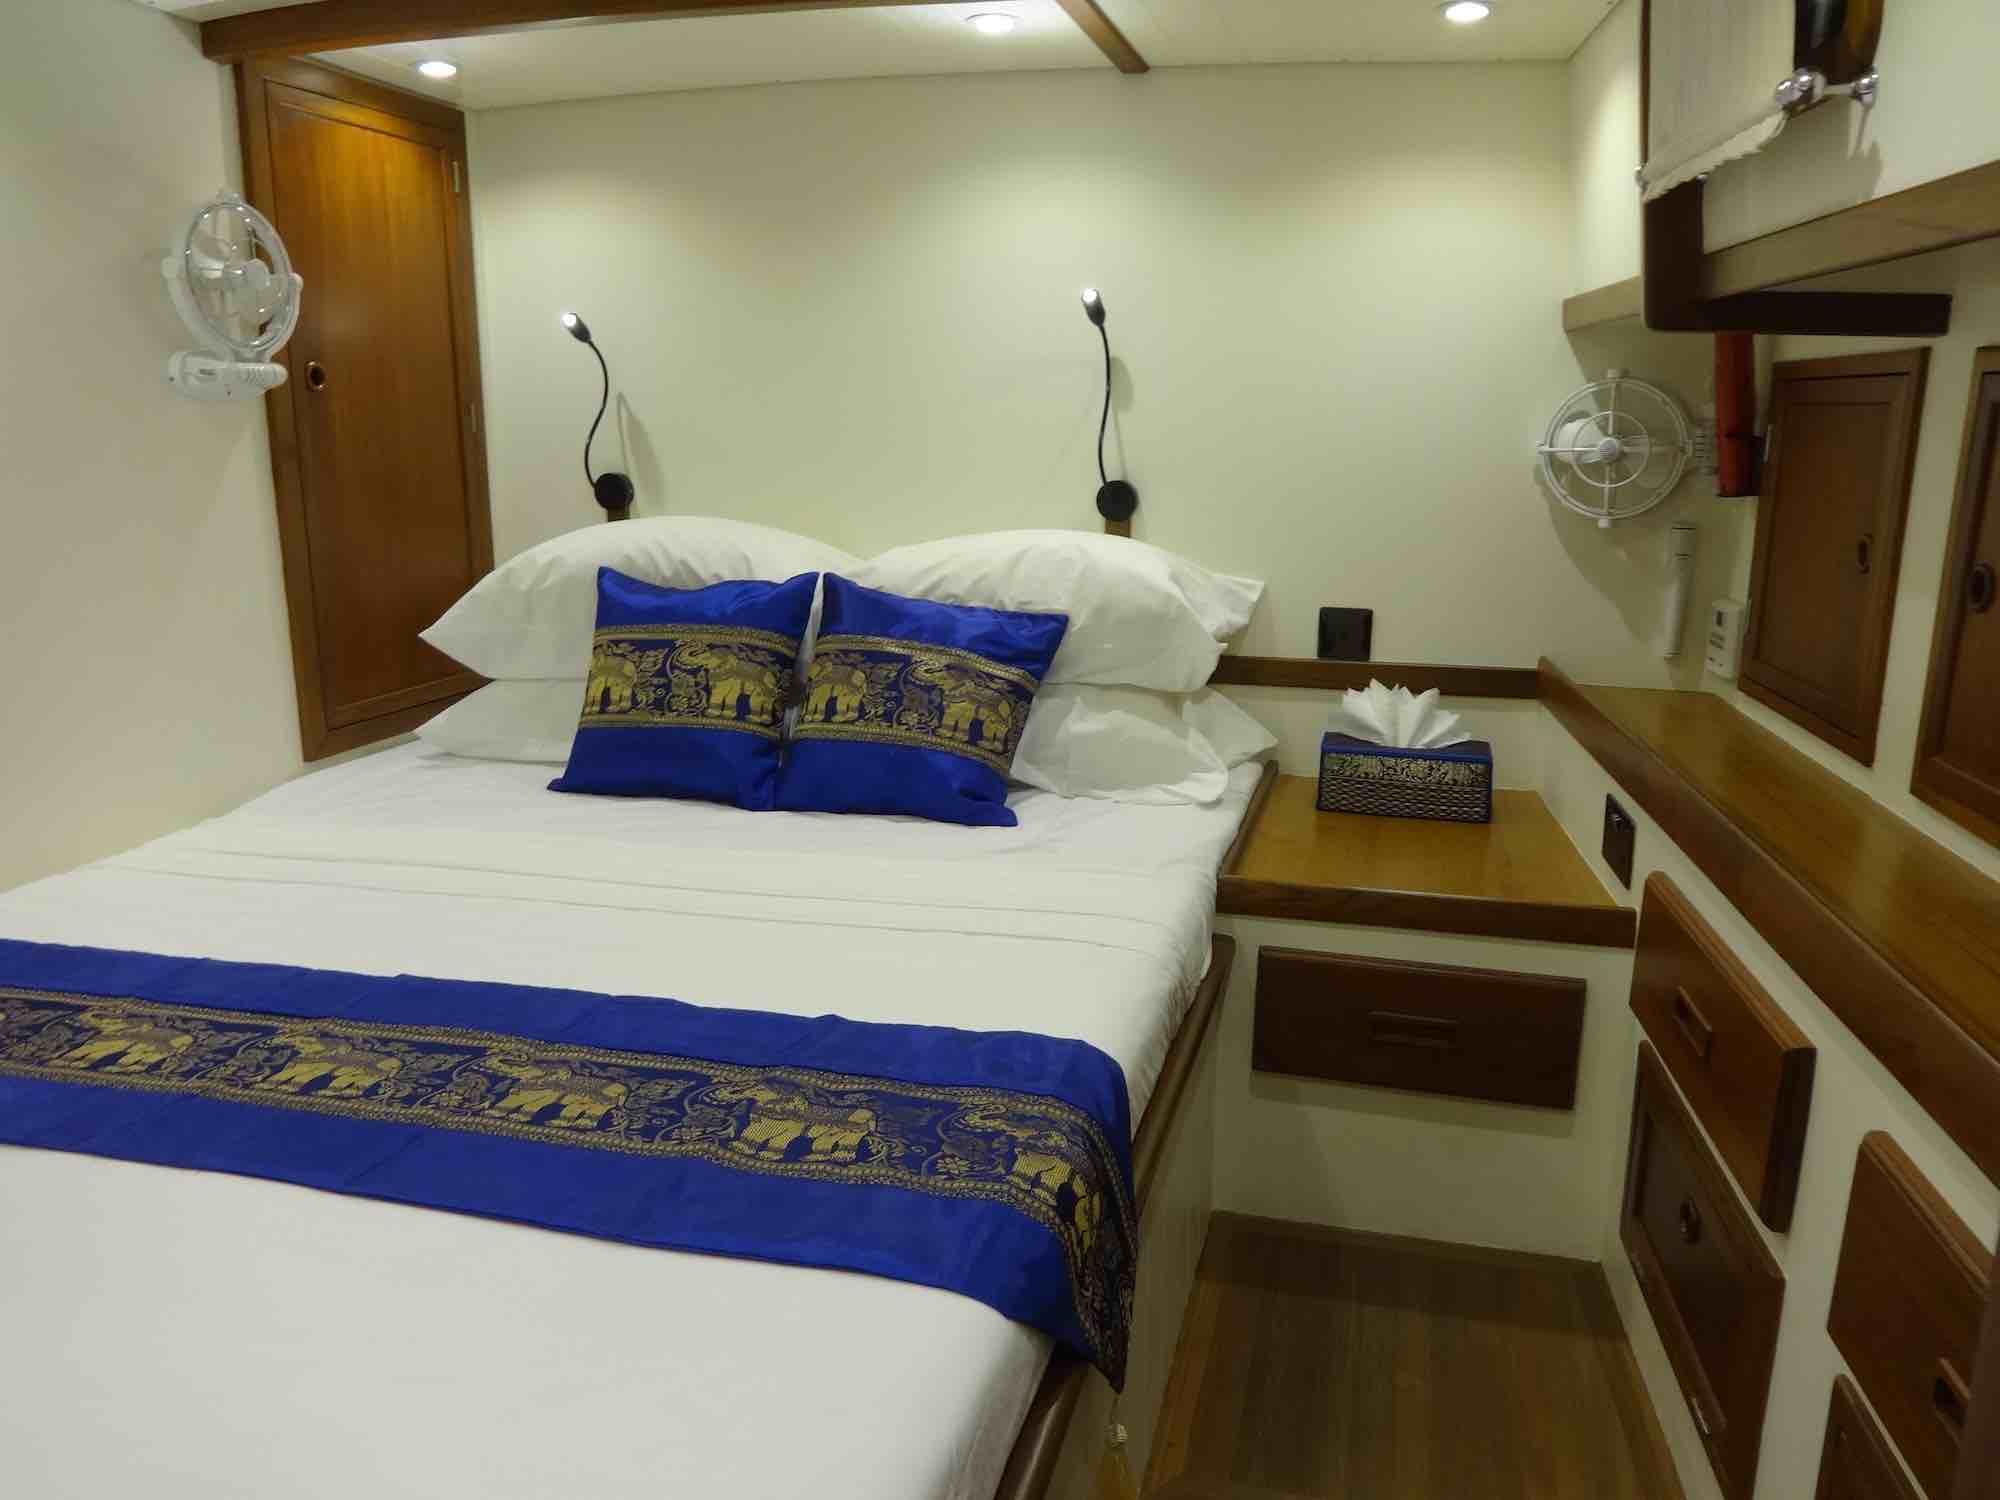 Dallinghoo_guest cabin blue throw pillows yacht trip in Mergui_XS.jpeg